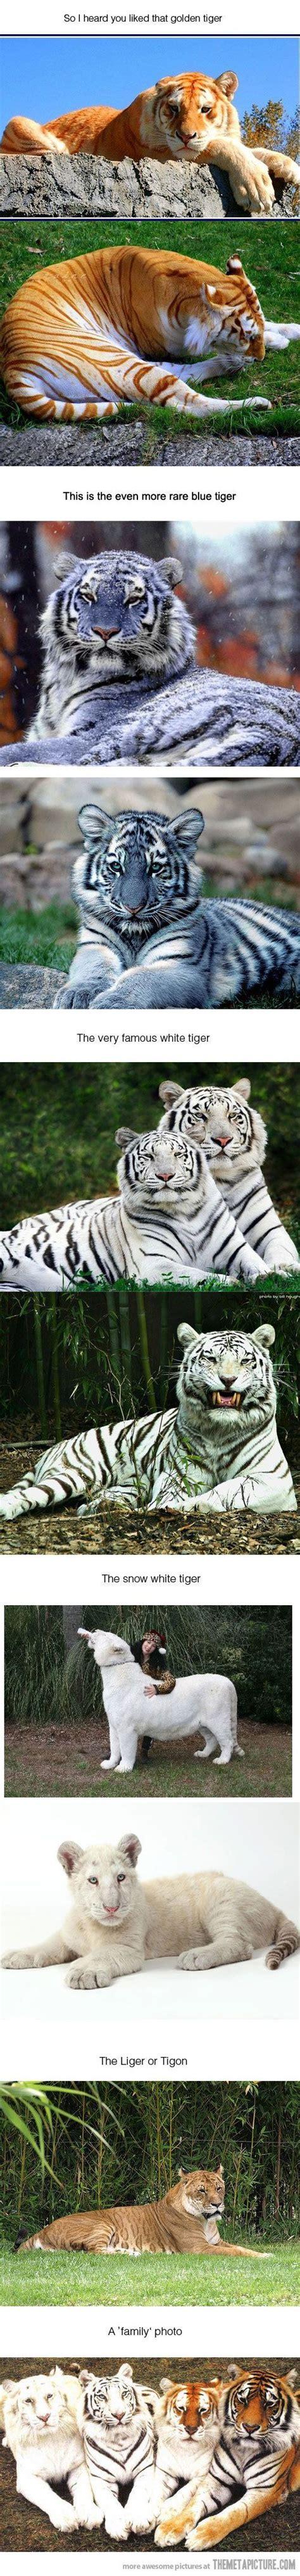 Tigers Animals Pets Golden Tiger Pinterest